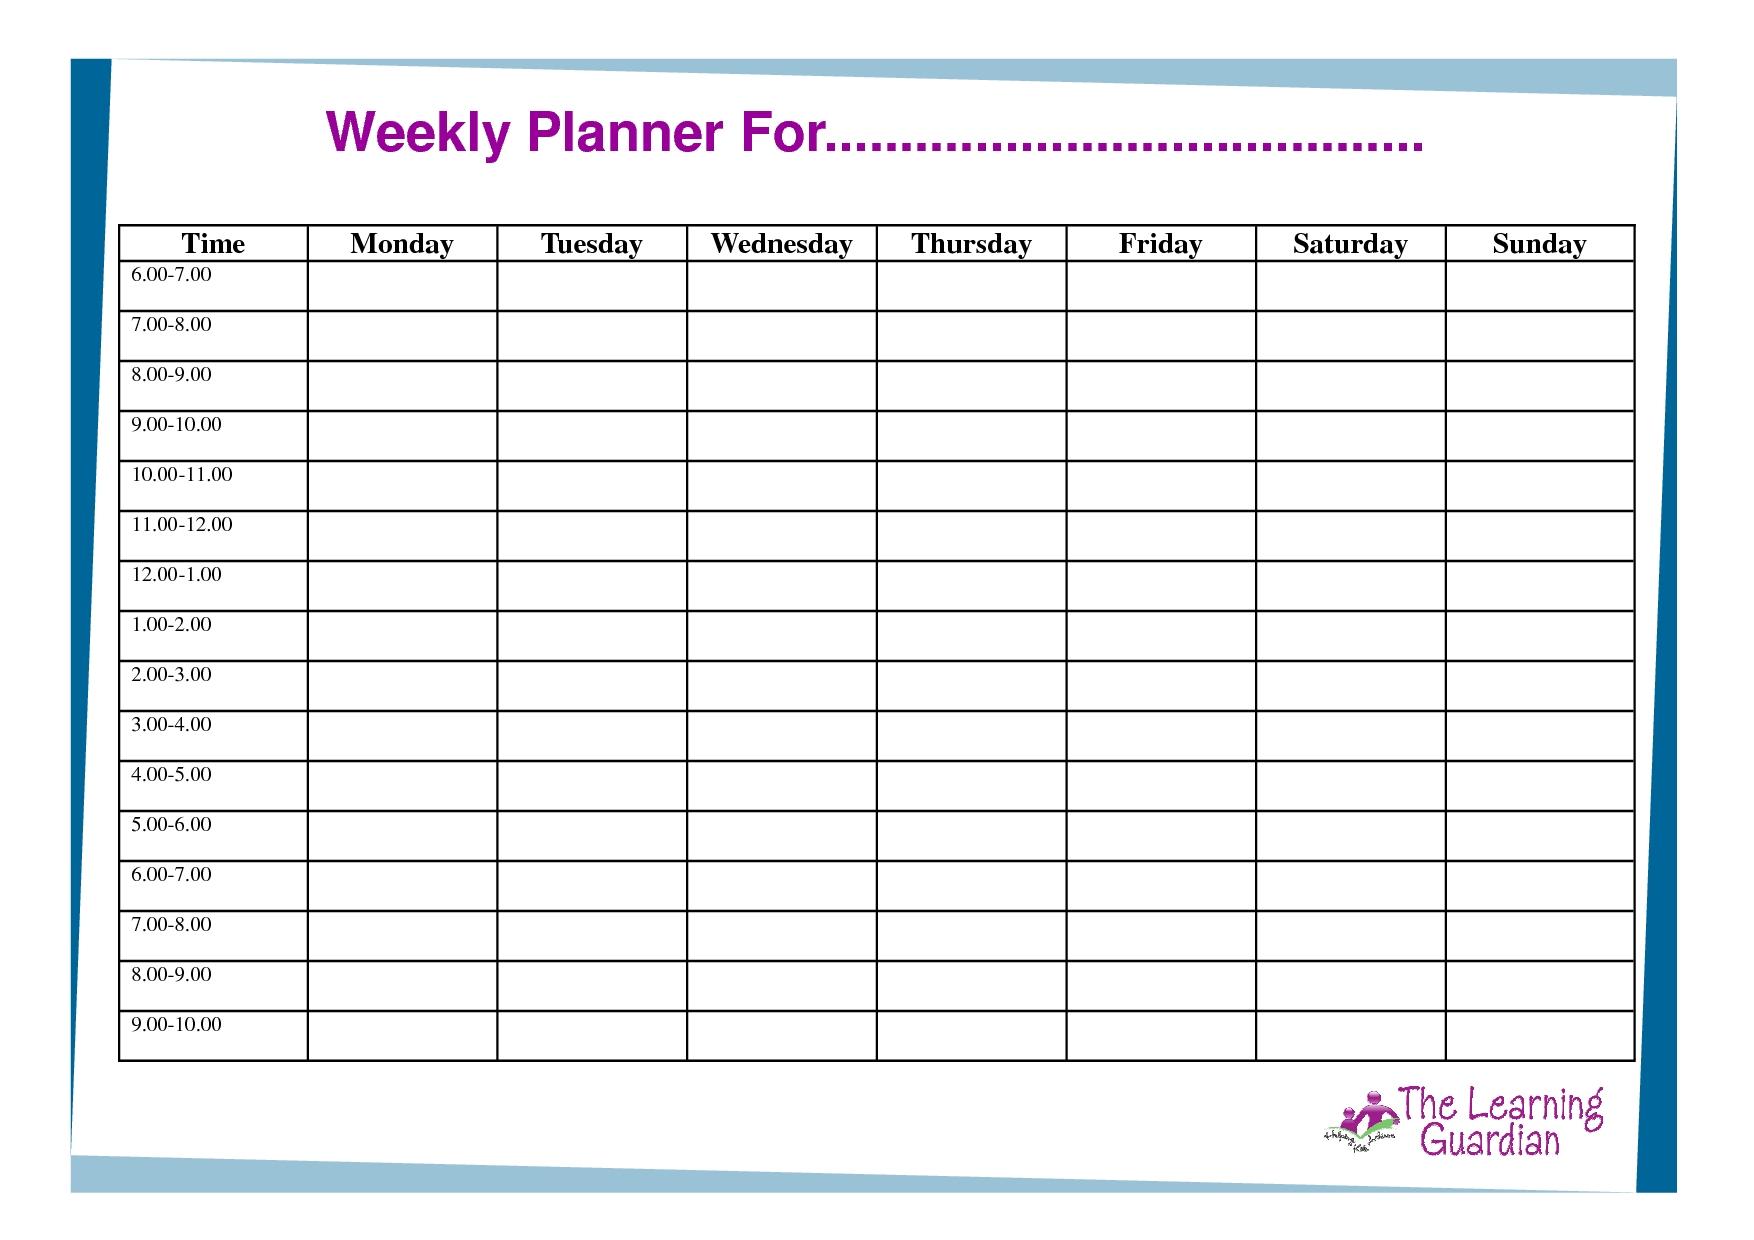 Free Printable Weekly Calendar Templates | Weekly Planner-Monday-Friday Blank Weekly Schedule